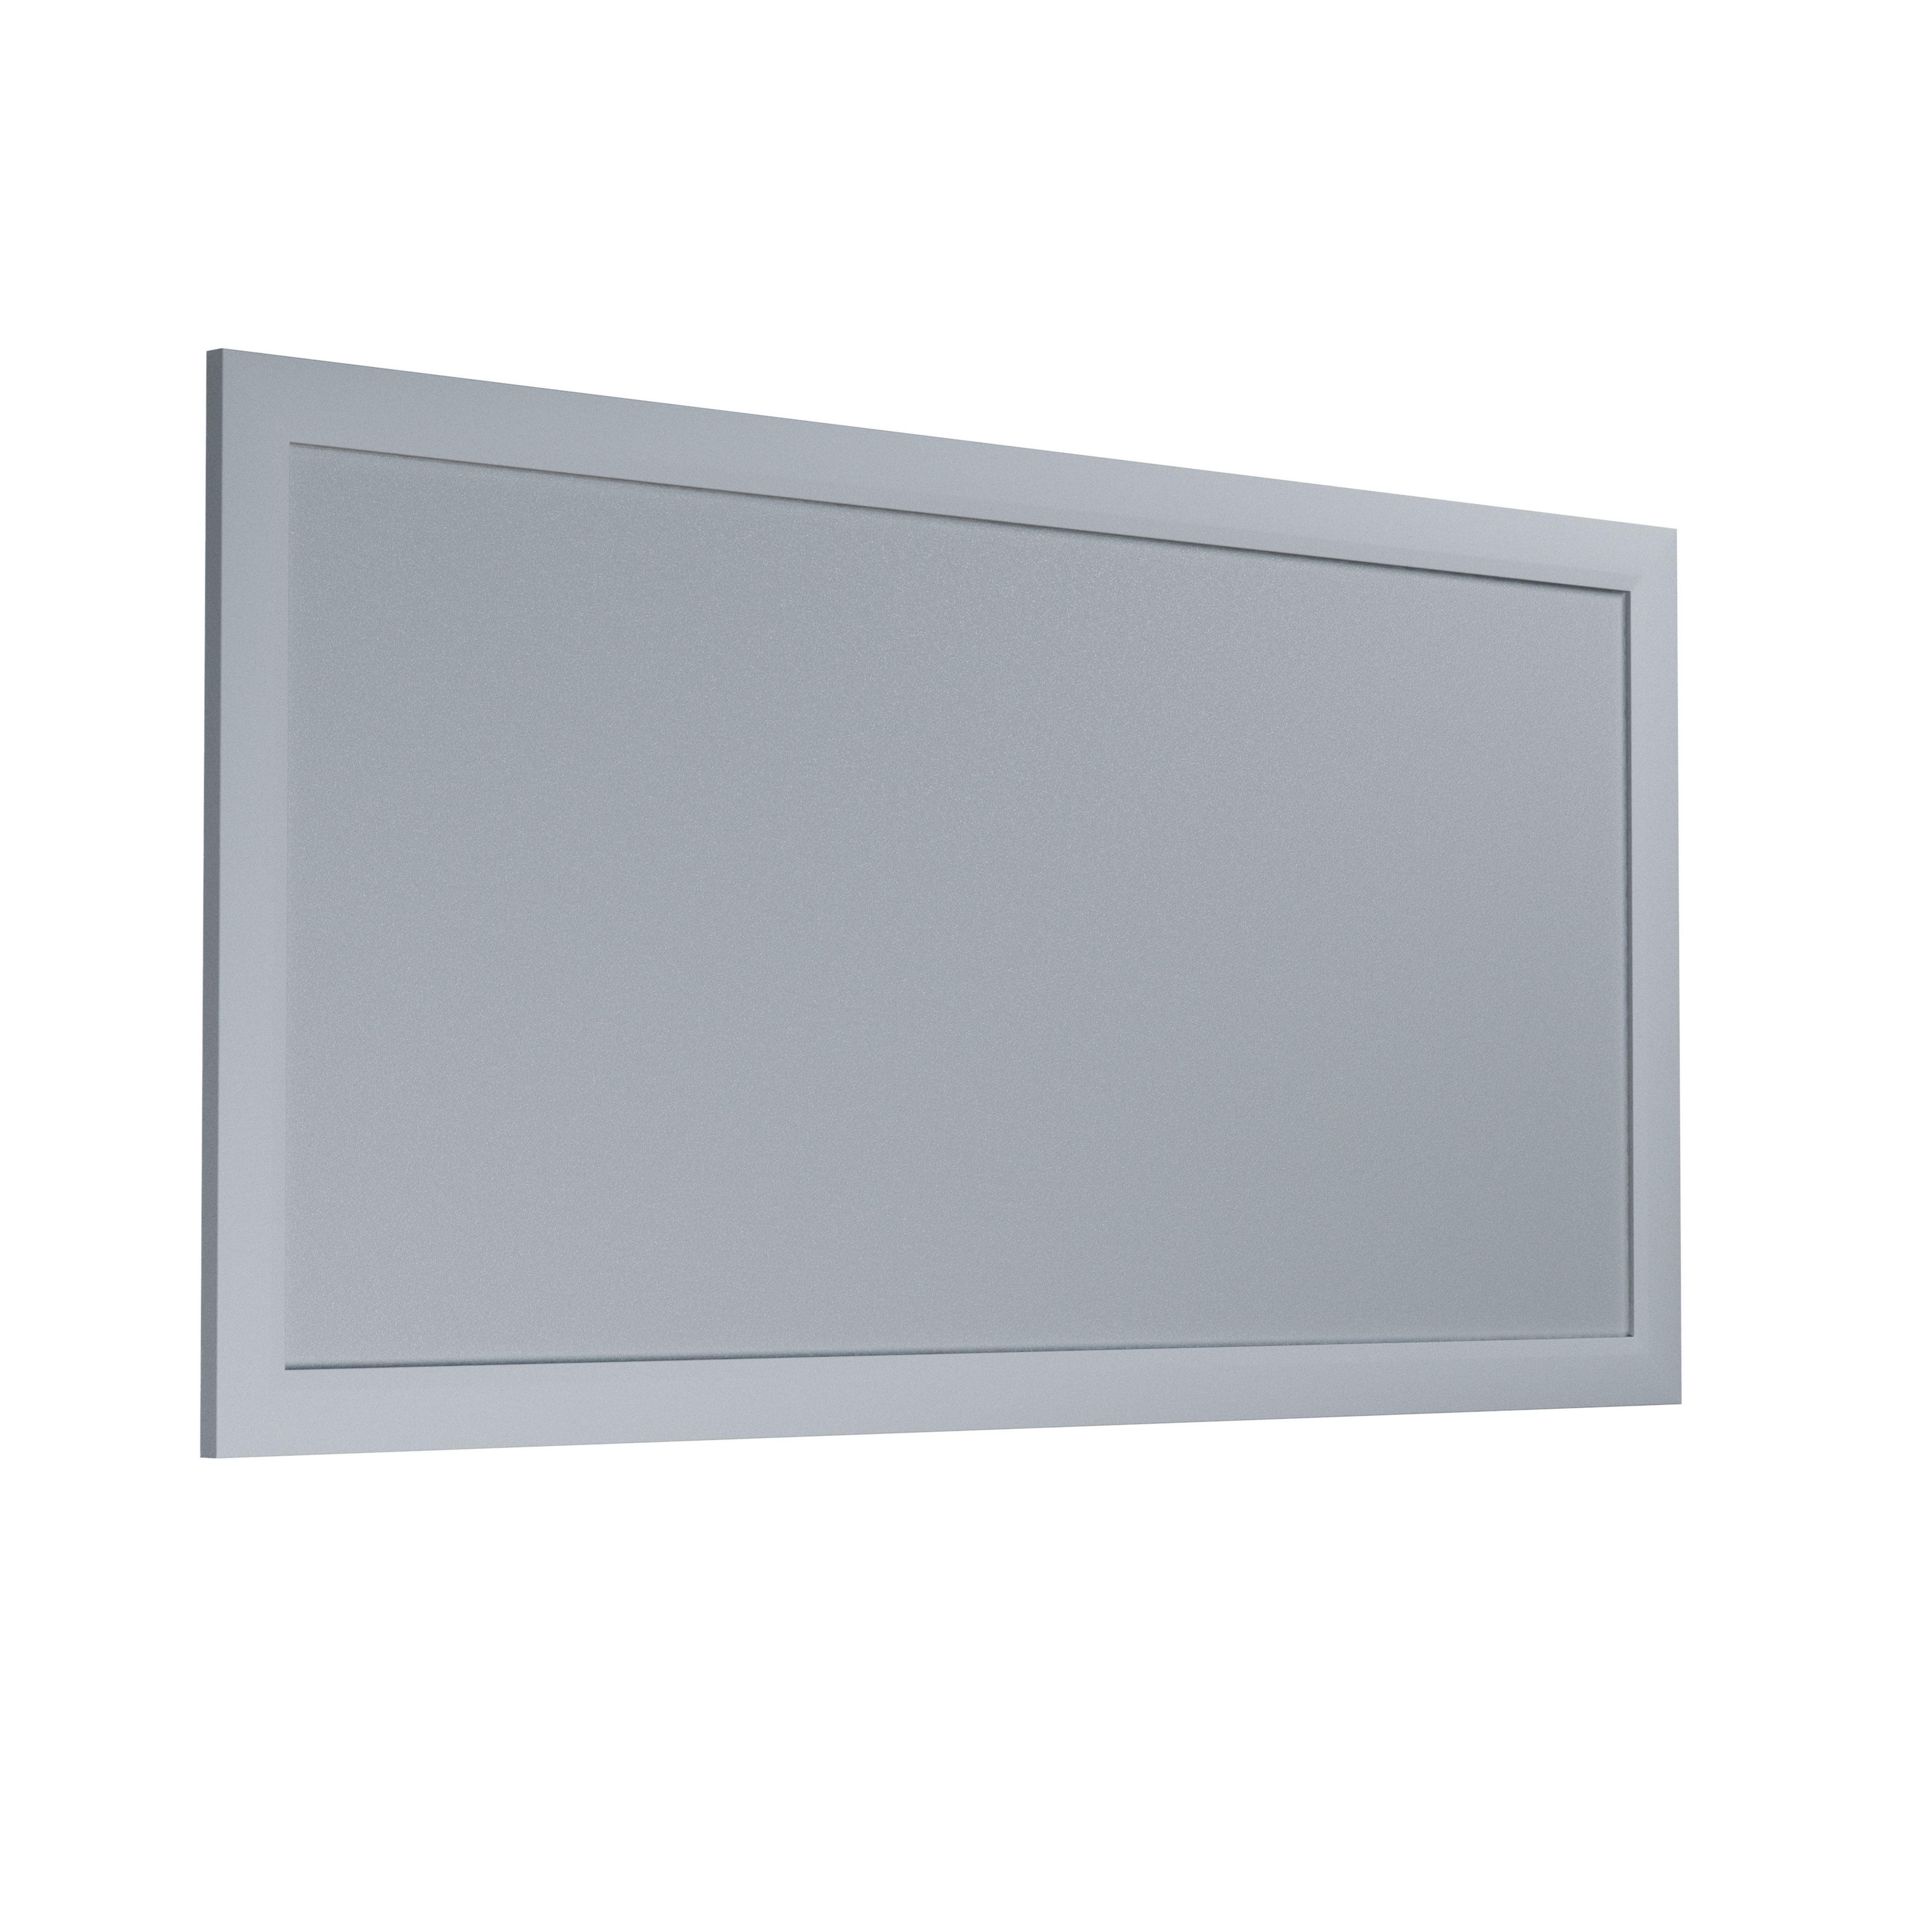 Osram LED-Panelleuchte, 15 W, 3000 K, 1400 lm »PLANON PLUS 30x60 15 W 830«